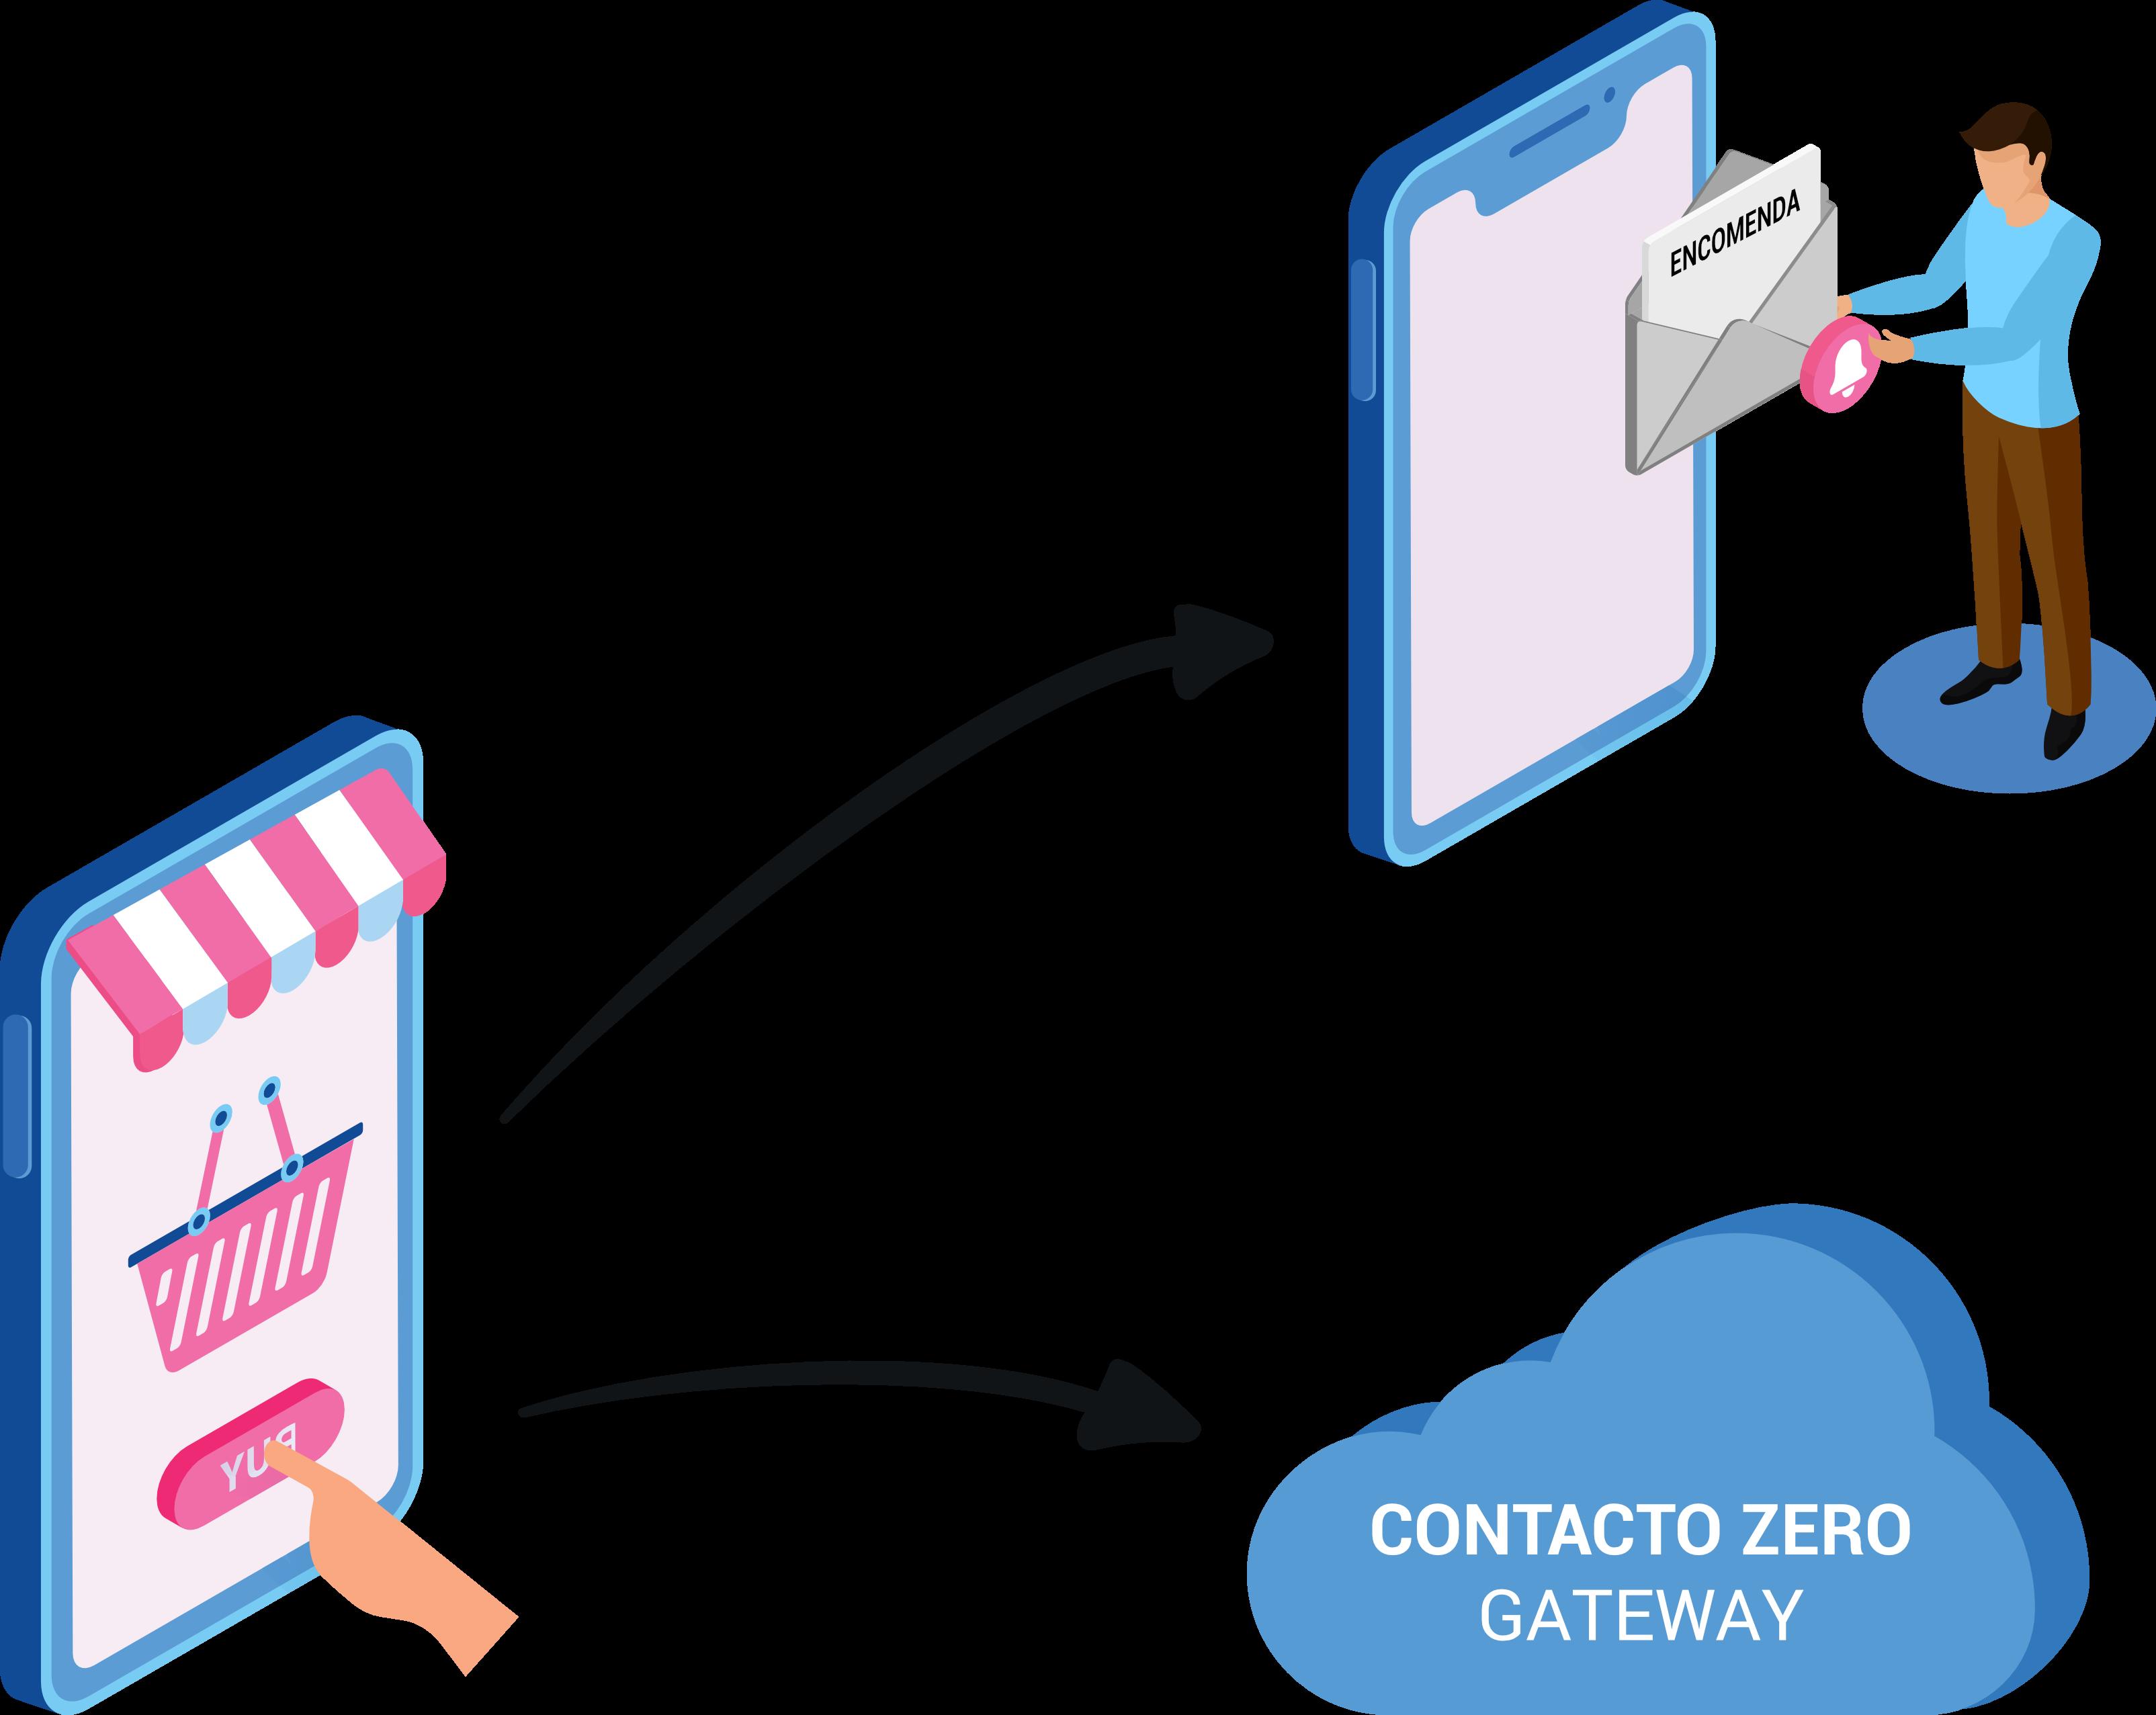 ContactoZero - gateway capa